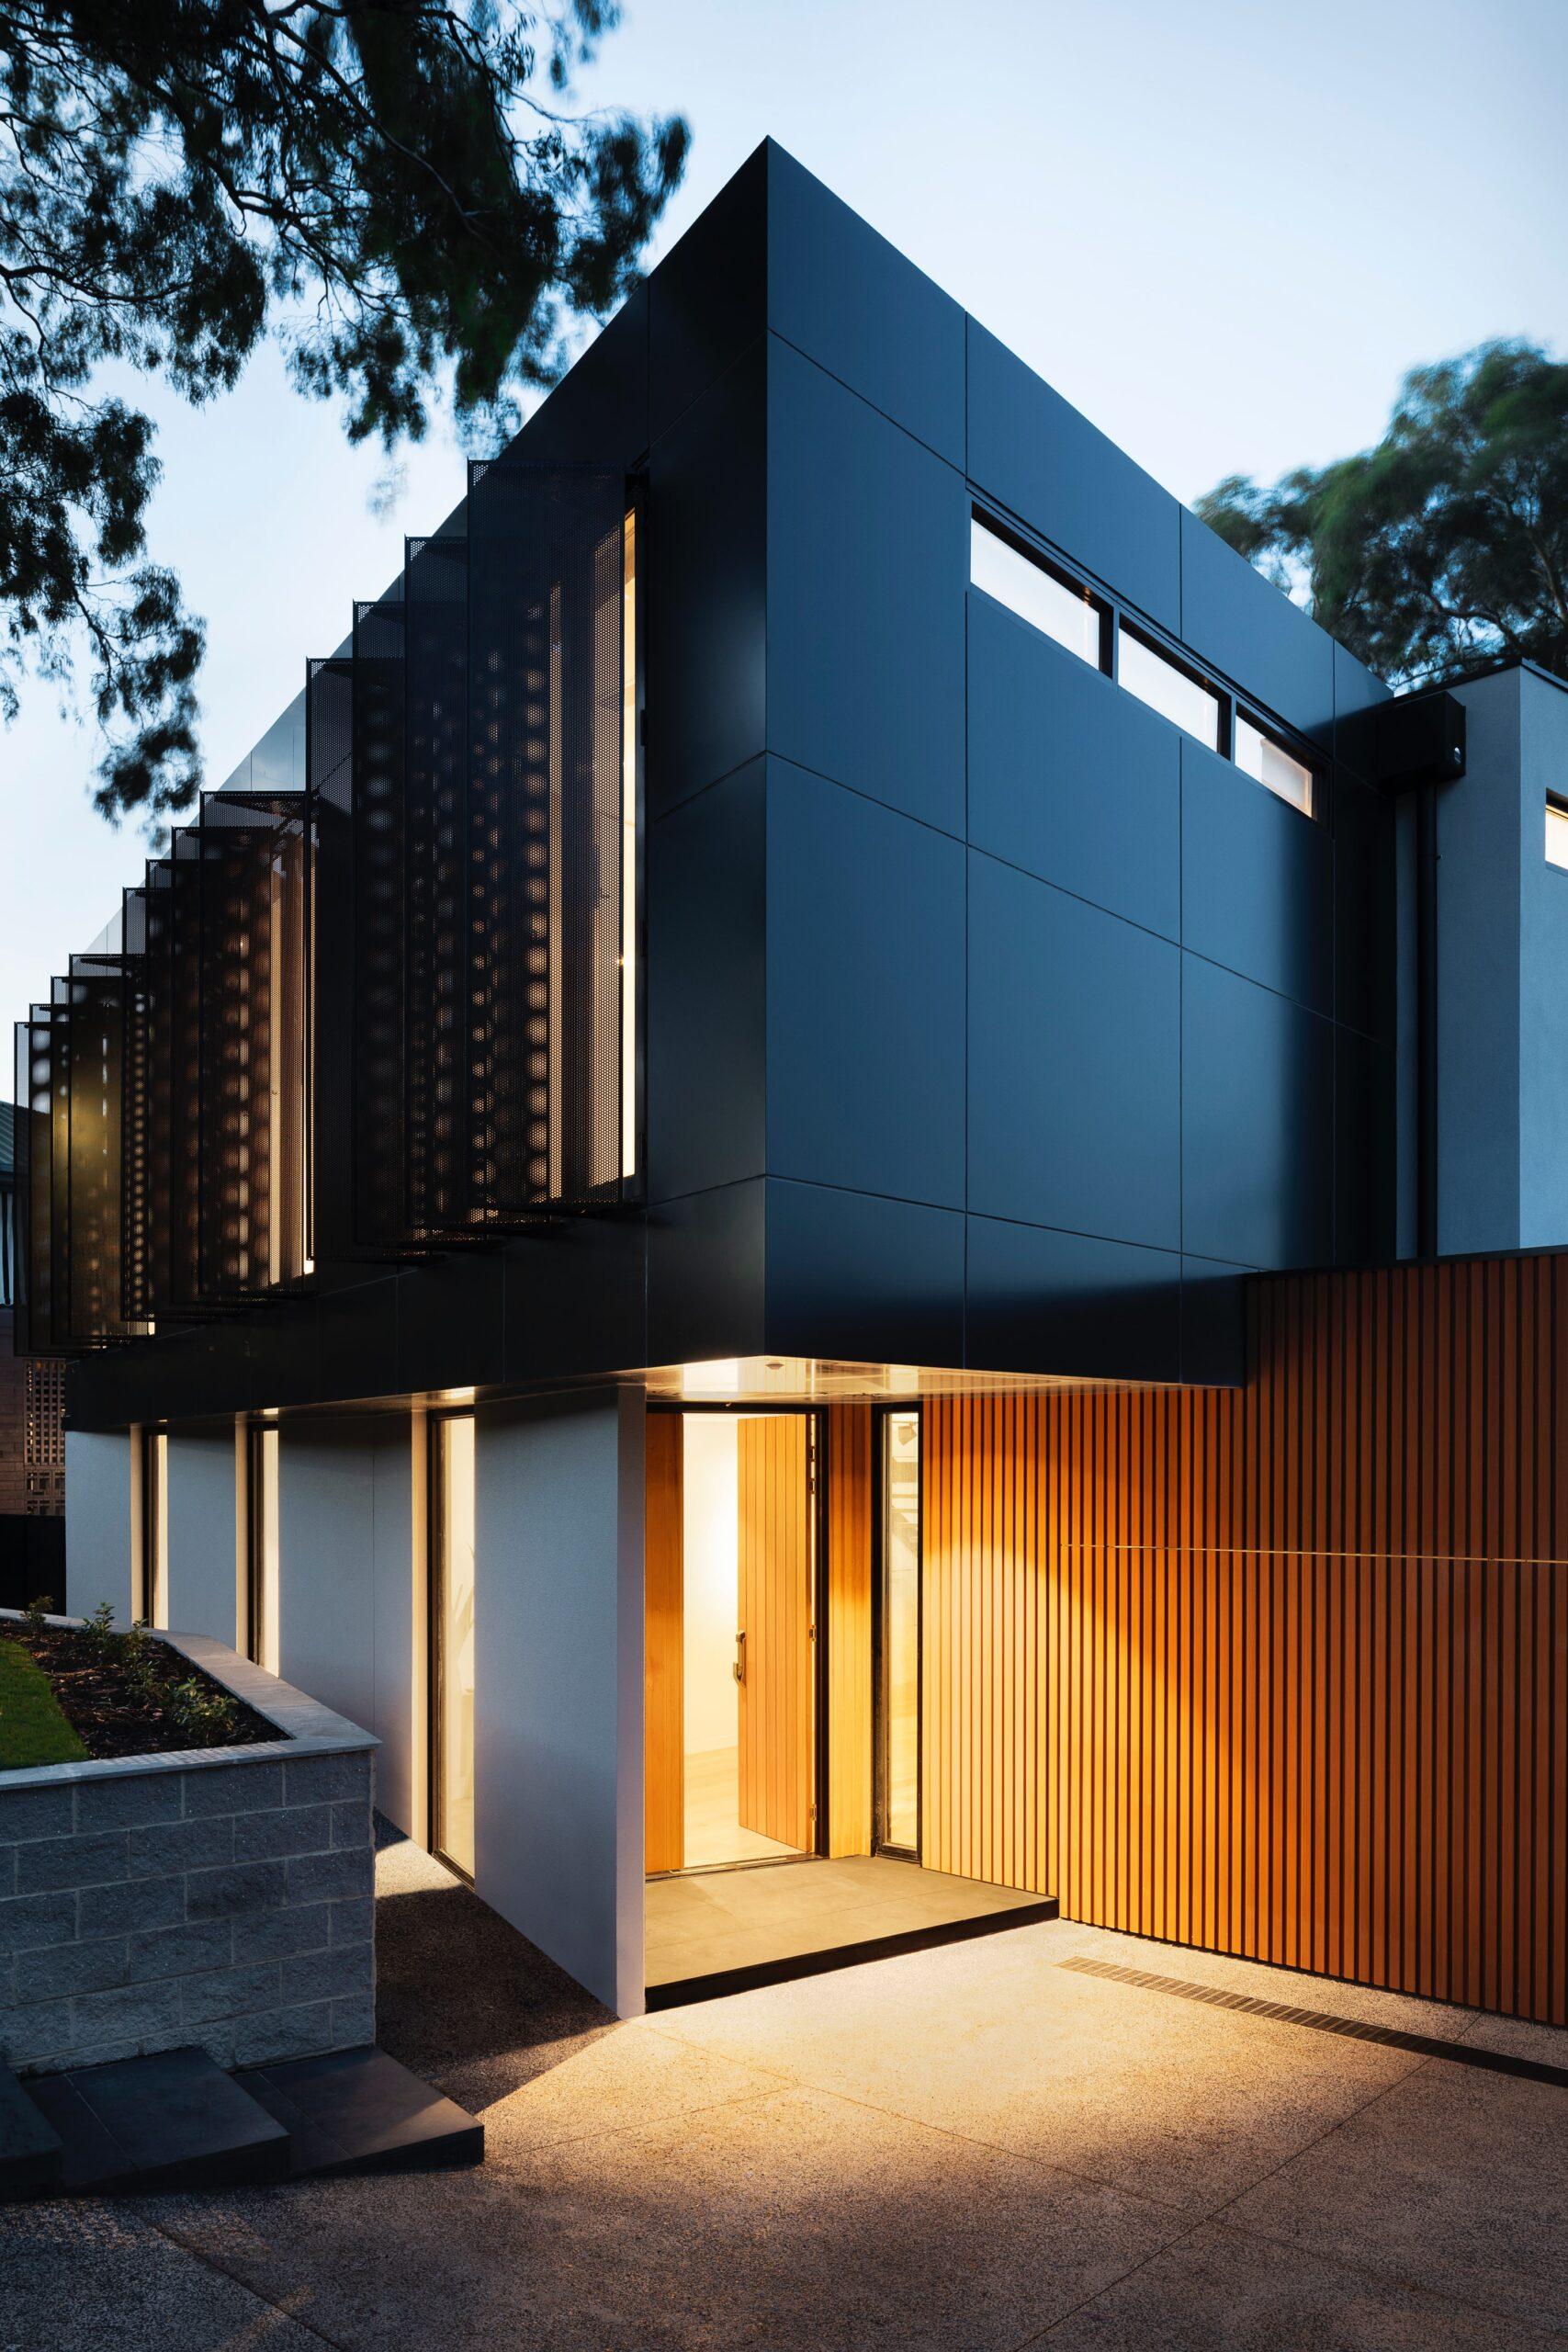 r-architecture-Contemporary smarthome remote controlled shutters-unsplash